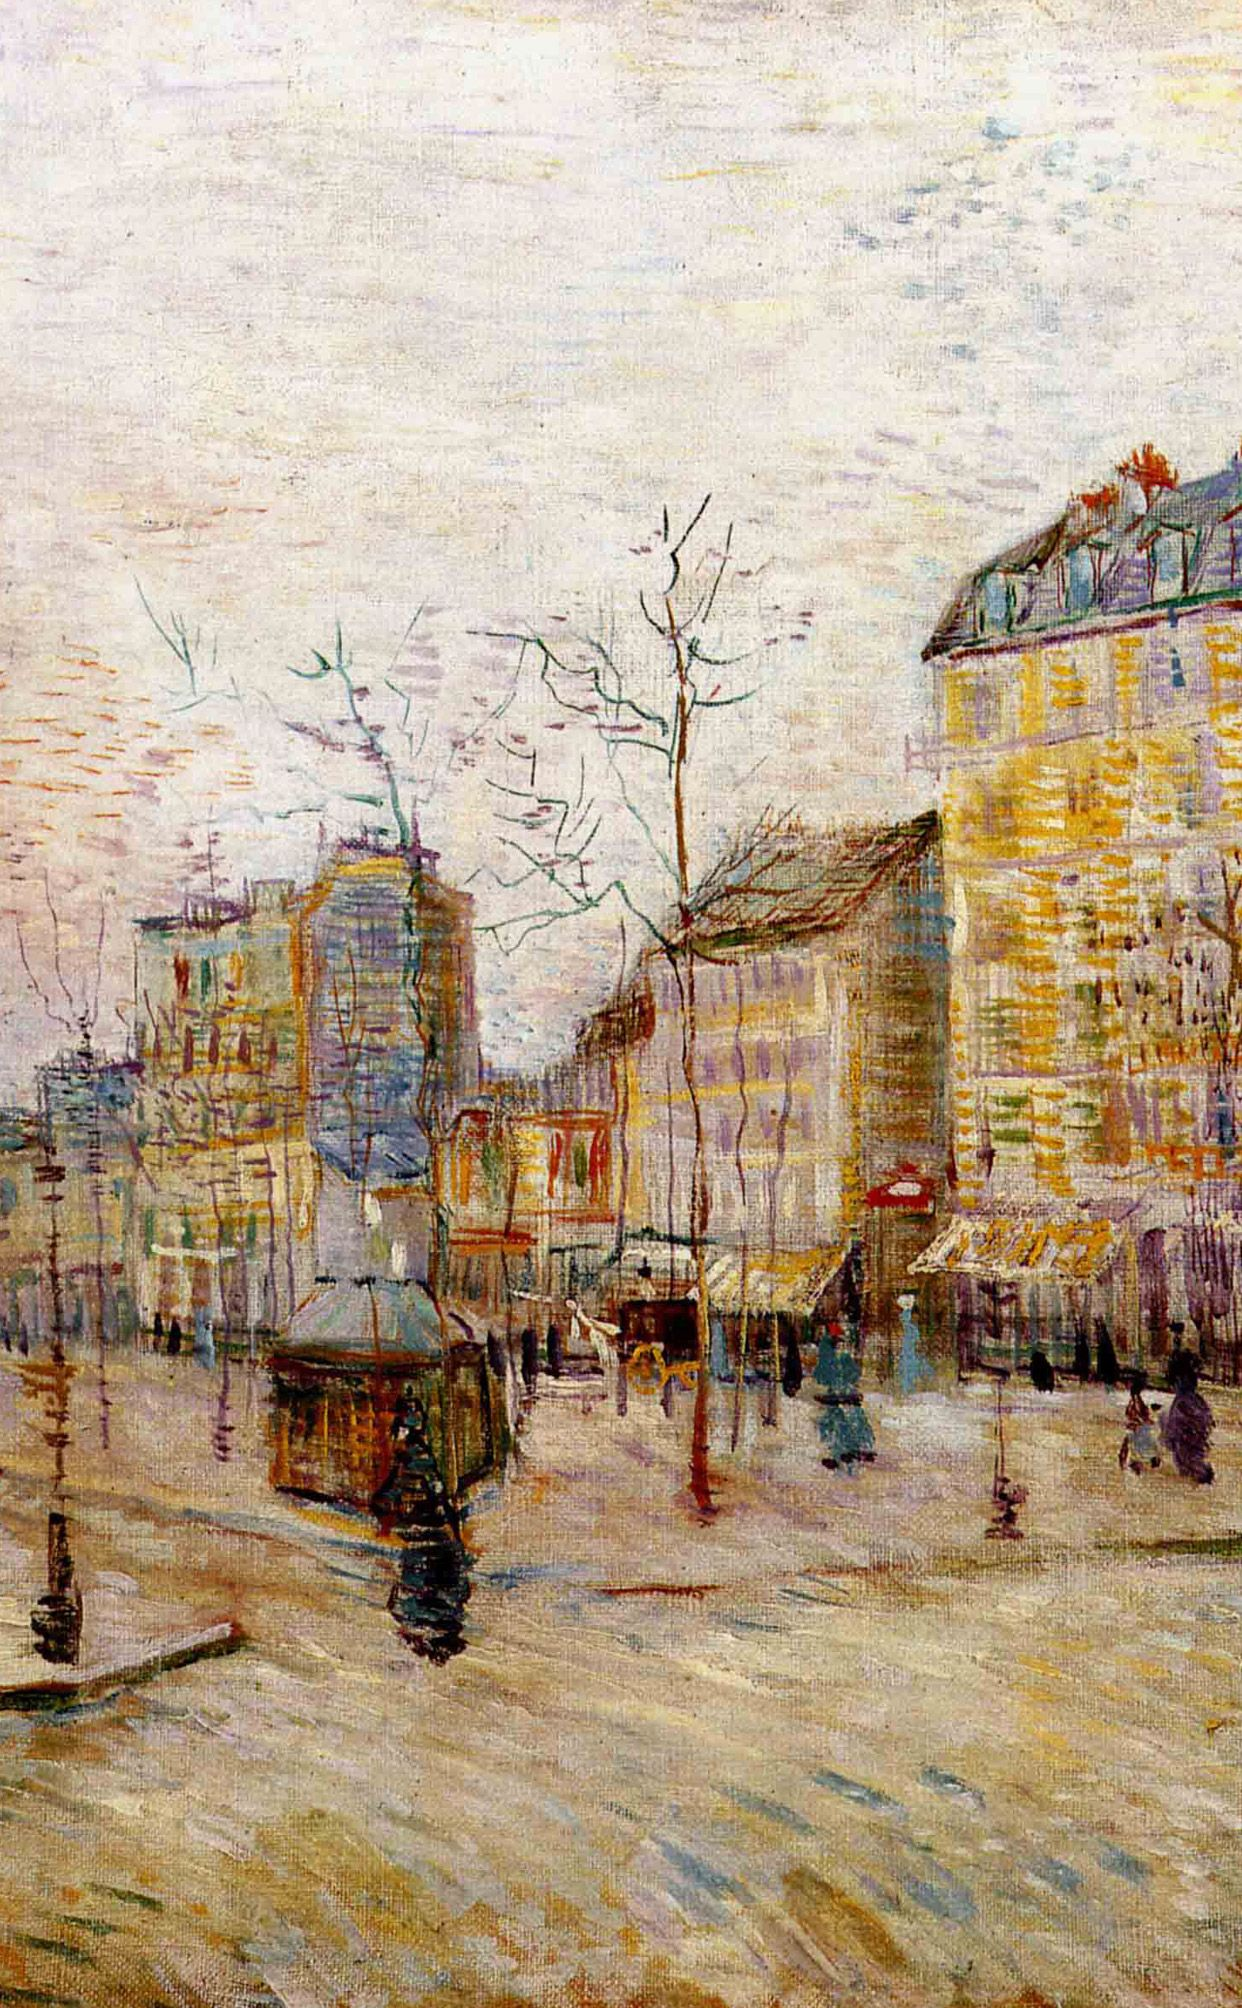 Van gogh iphone wallpaper tumblr - Explore Vincent Van Gogh Iphone Wallpaper And More